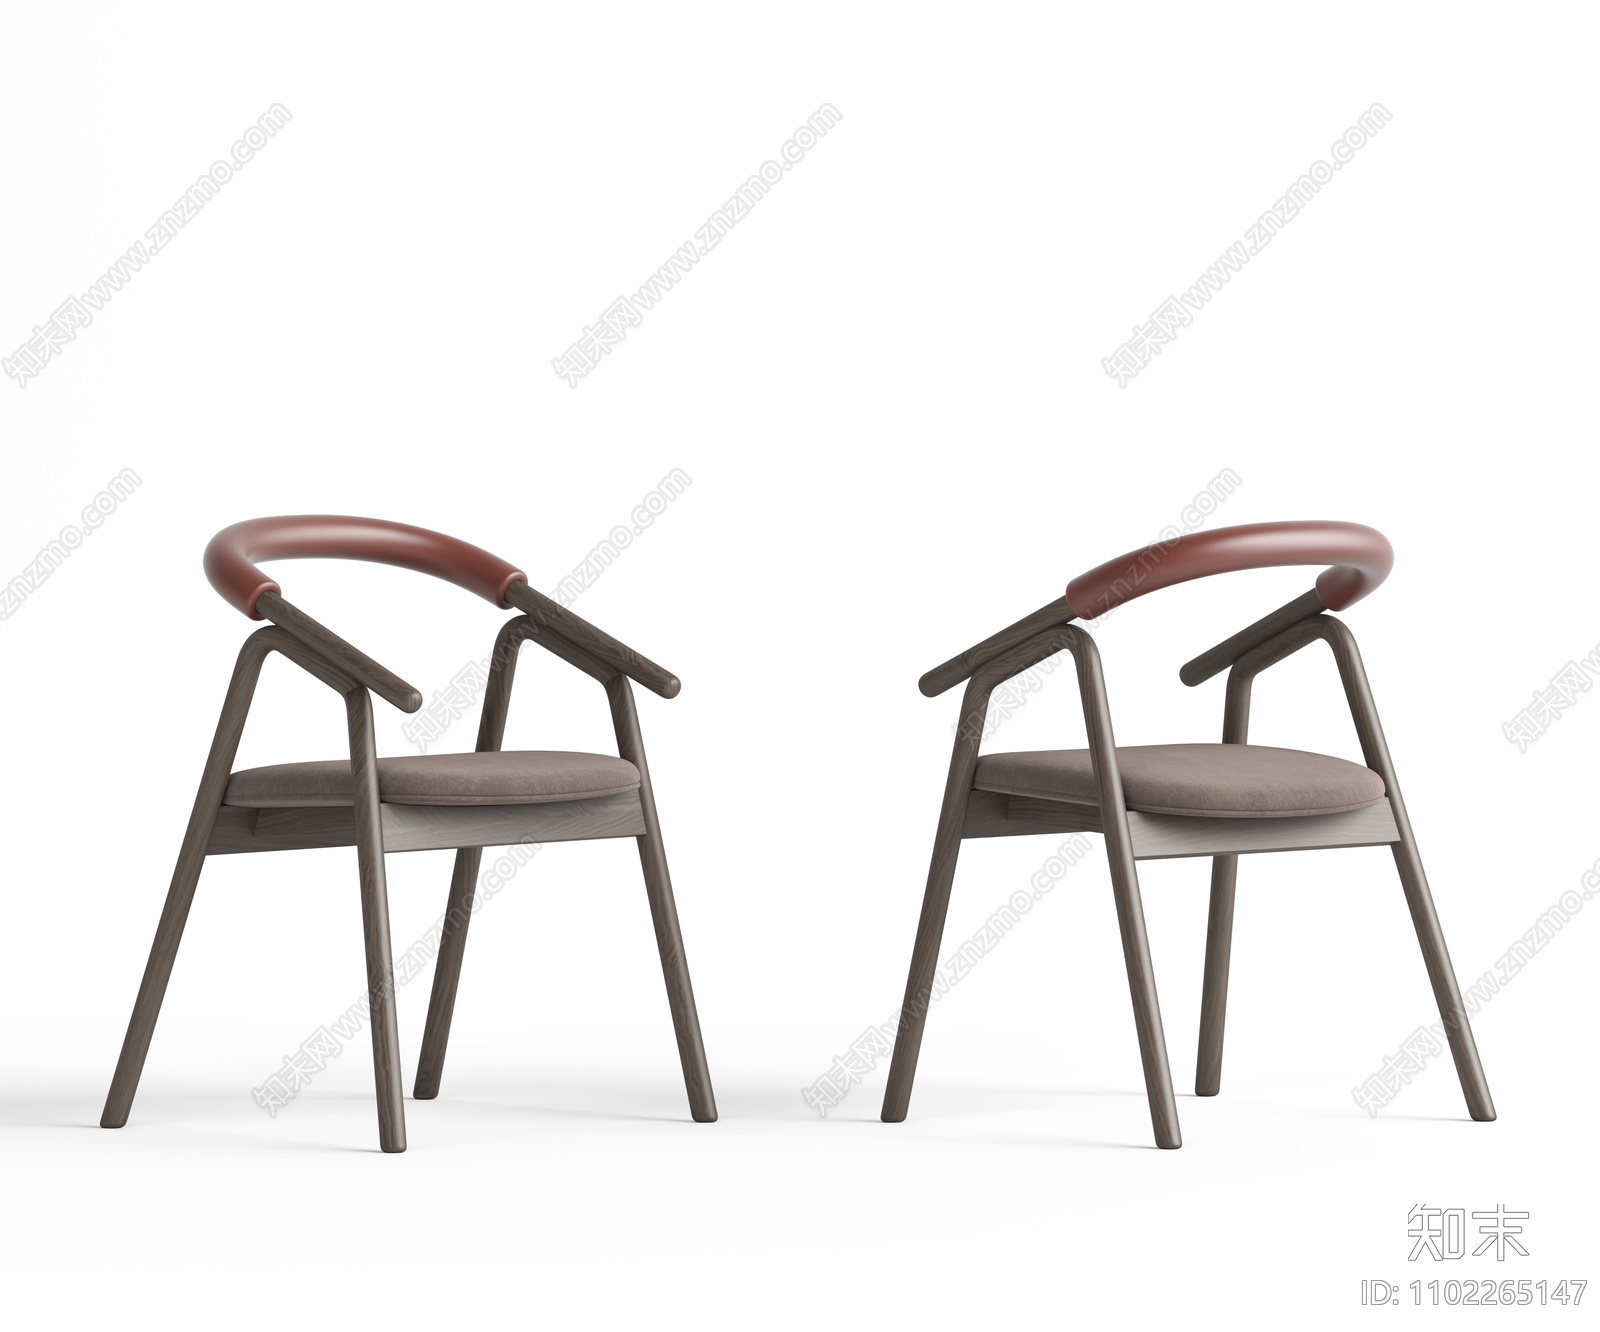 现代休闲椅SU模型下载【ID:1102265147】